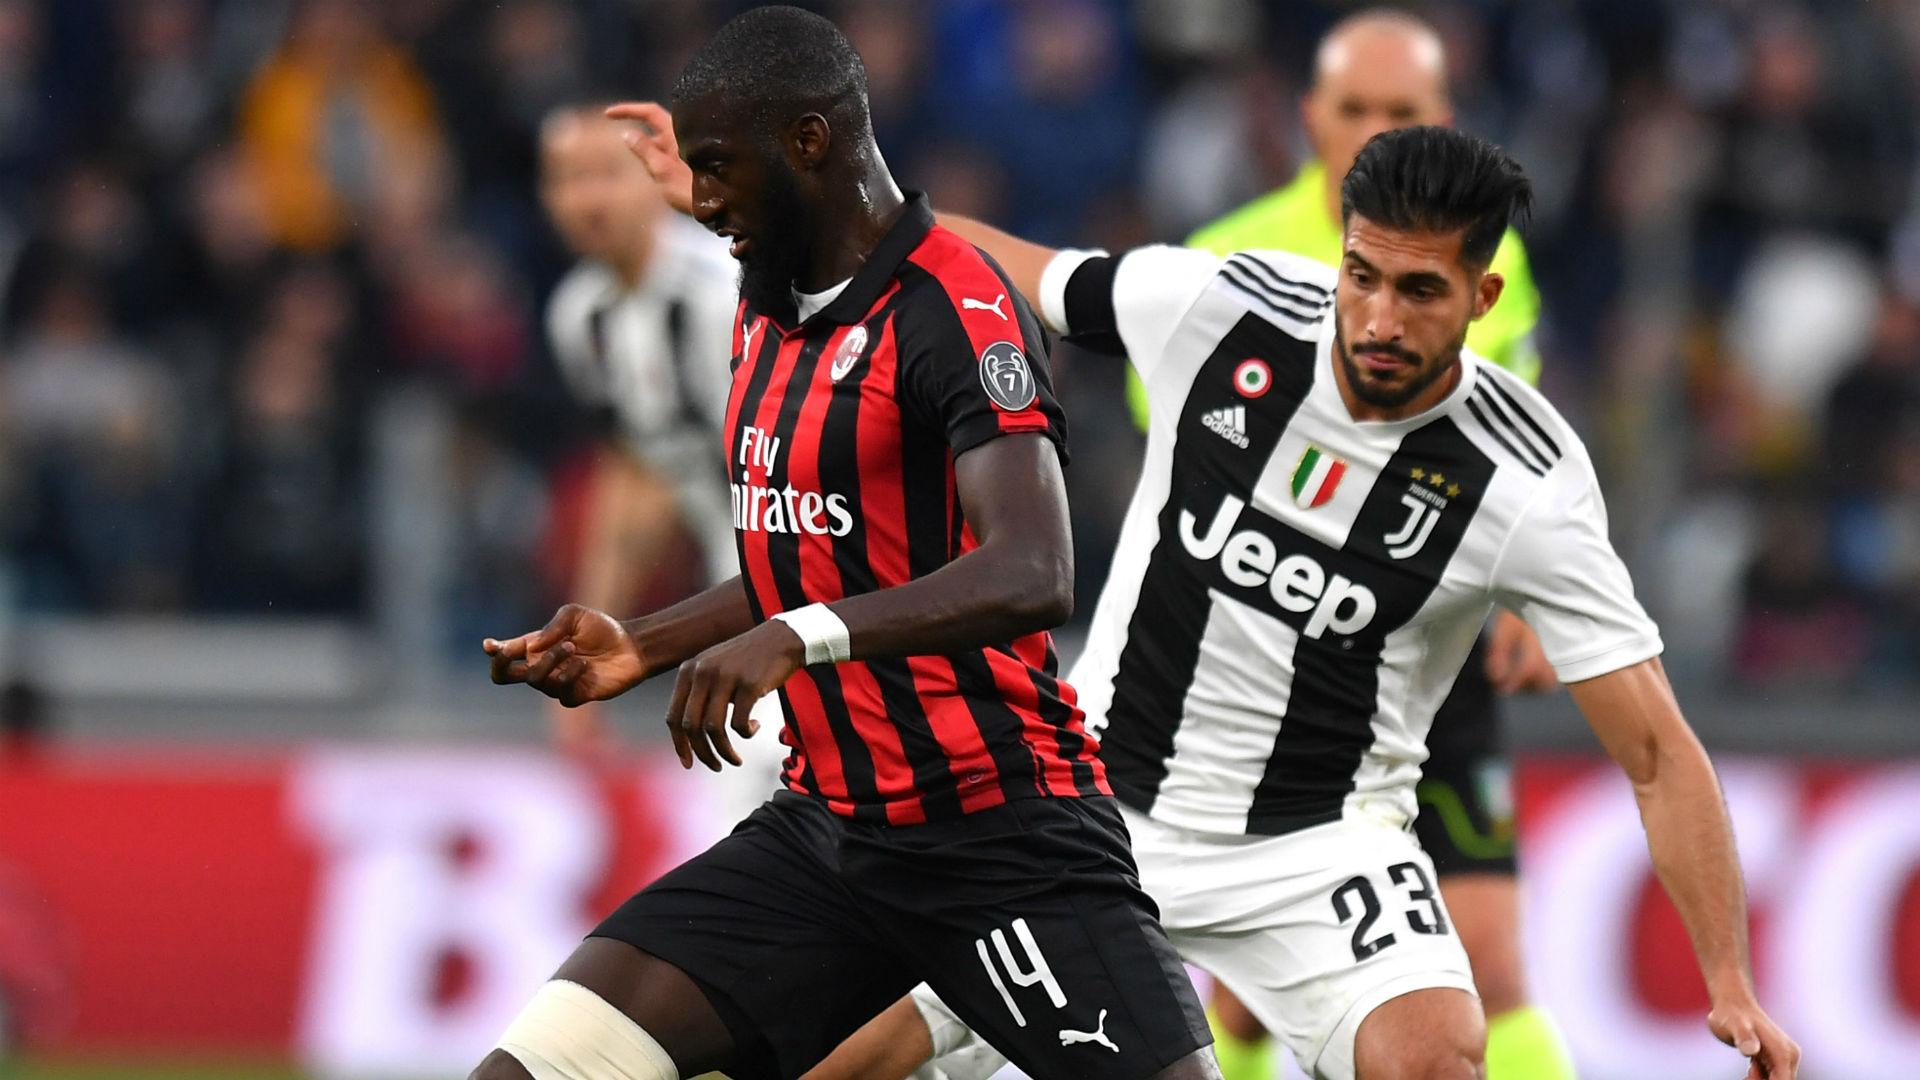 Juventus, infortunio per Emre Can: torna Khedira!